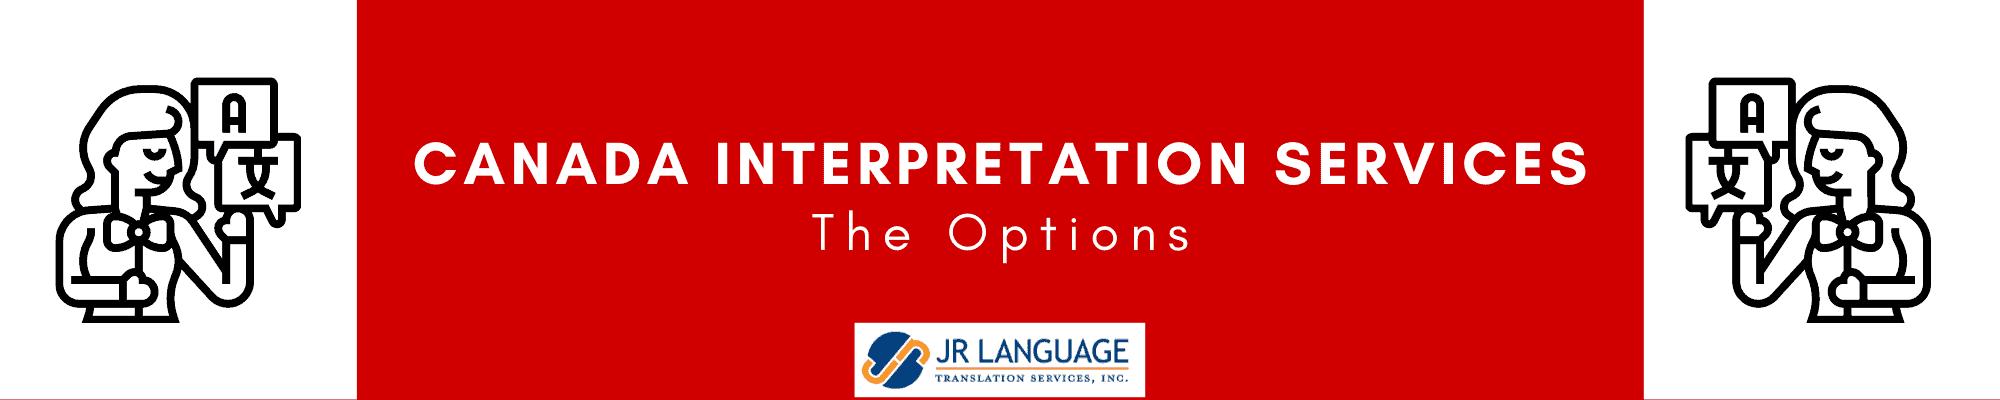 Canada Language interpretation Services and options